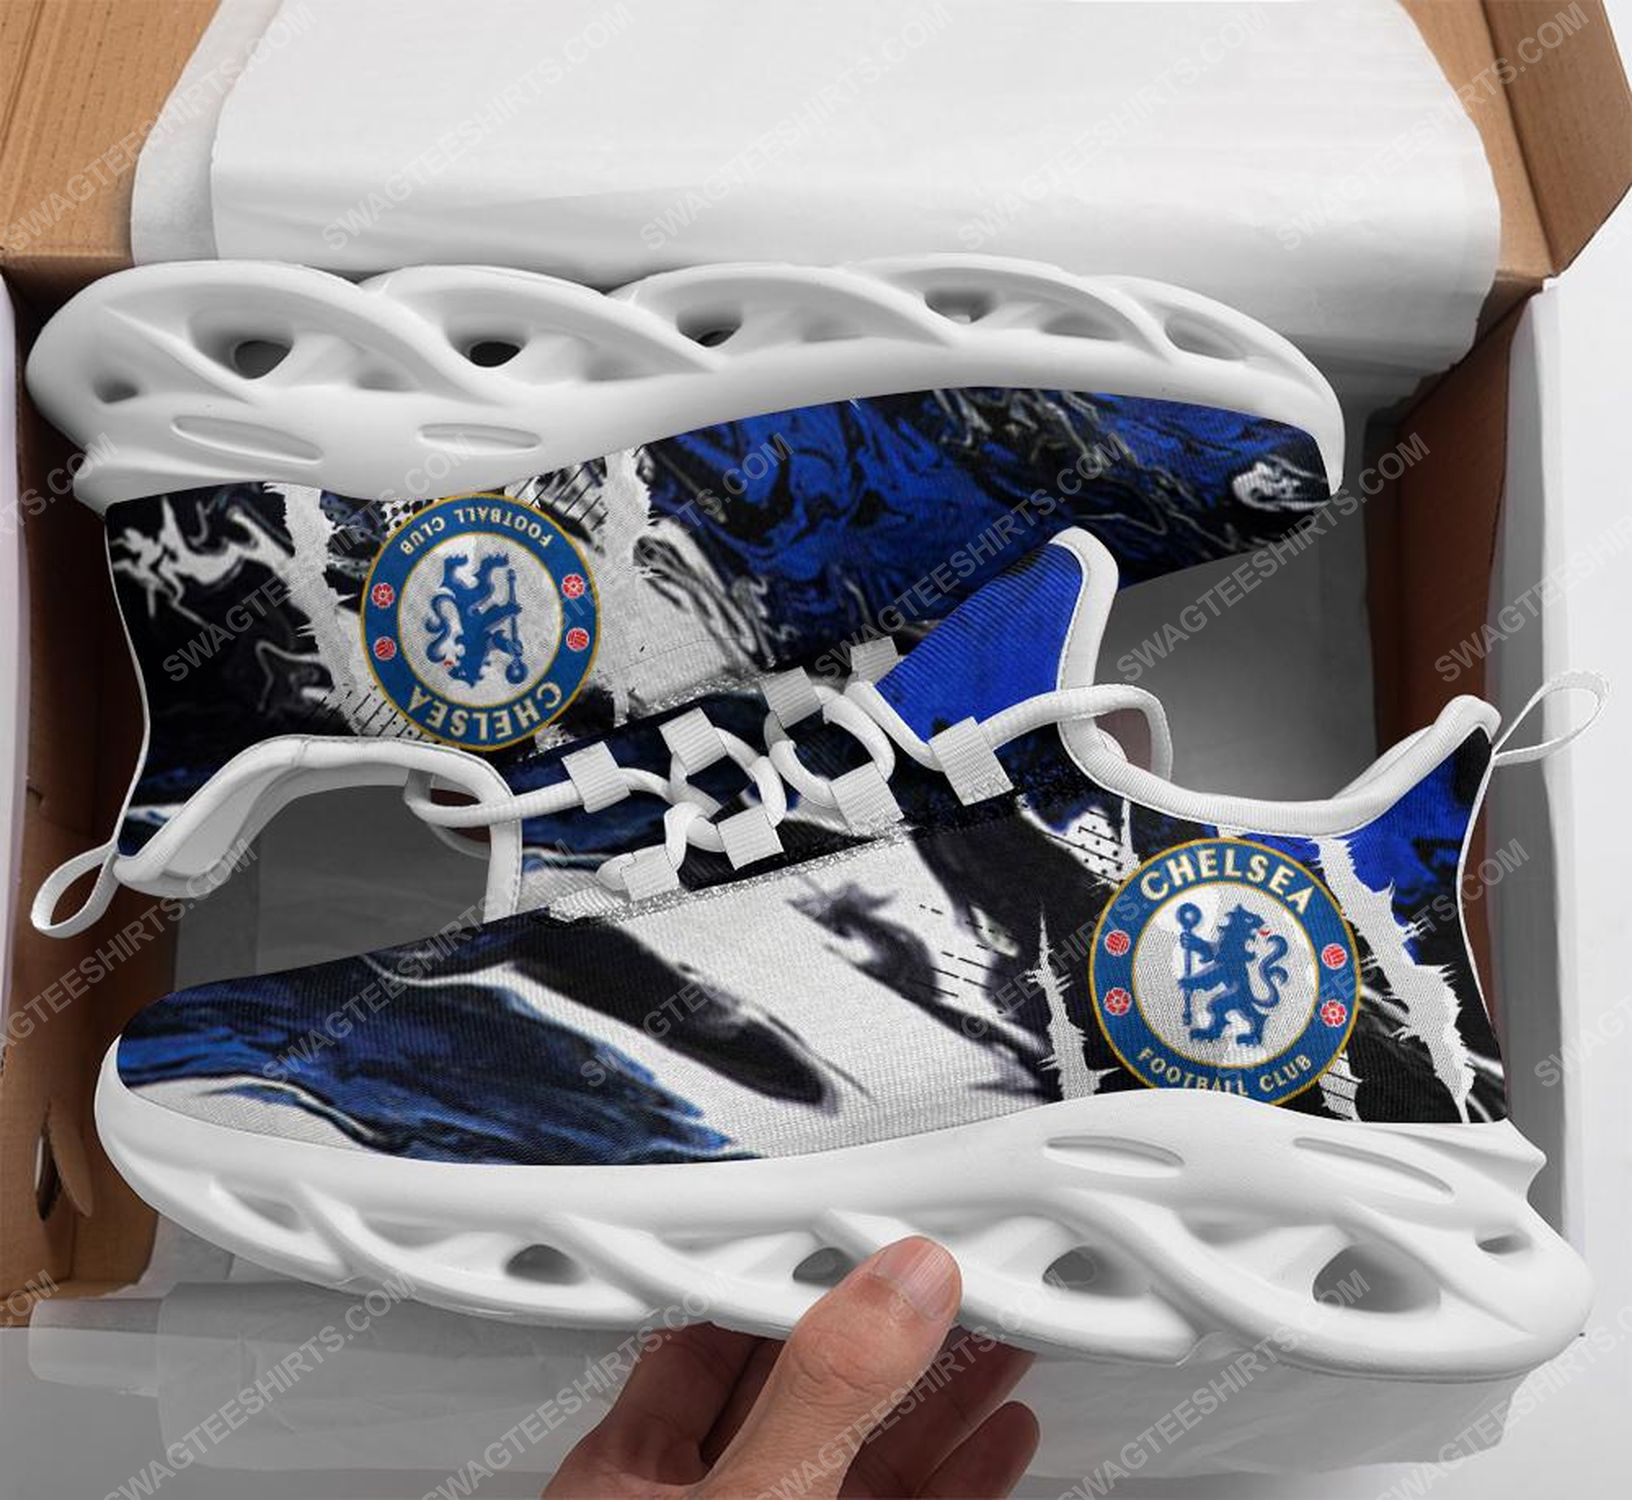 Chelsea football club max soul shoes 1